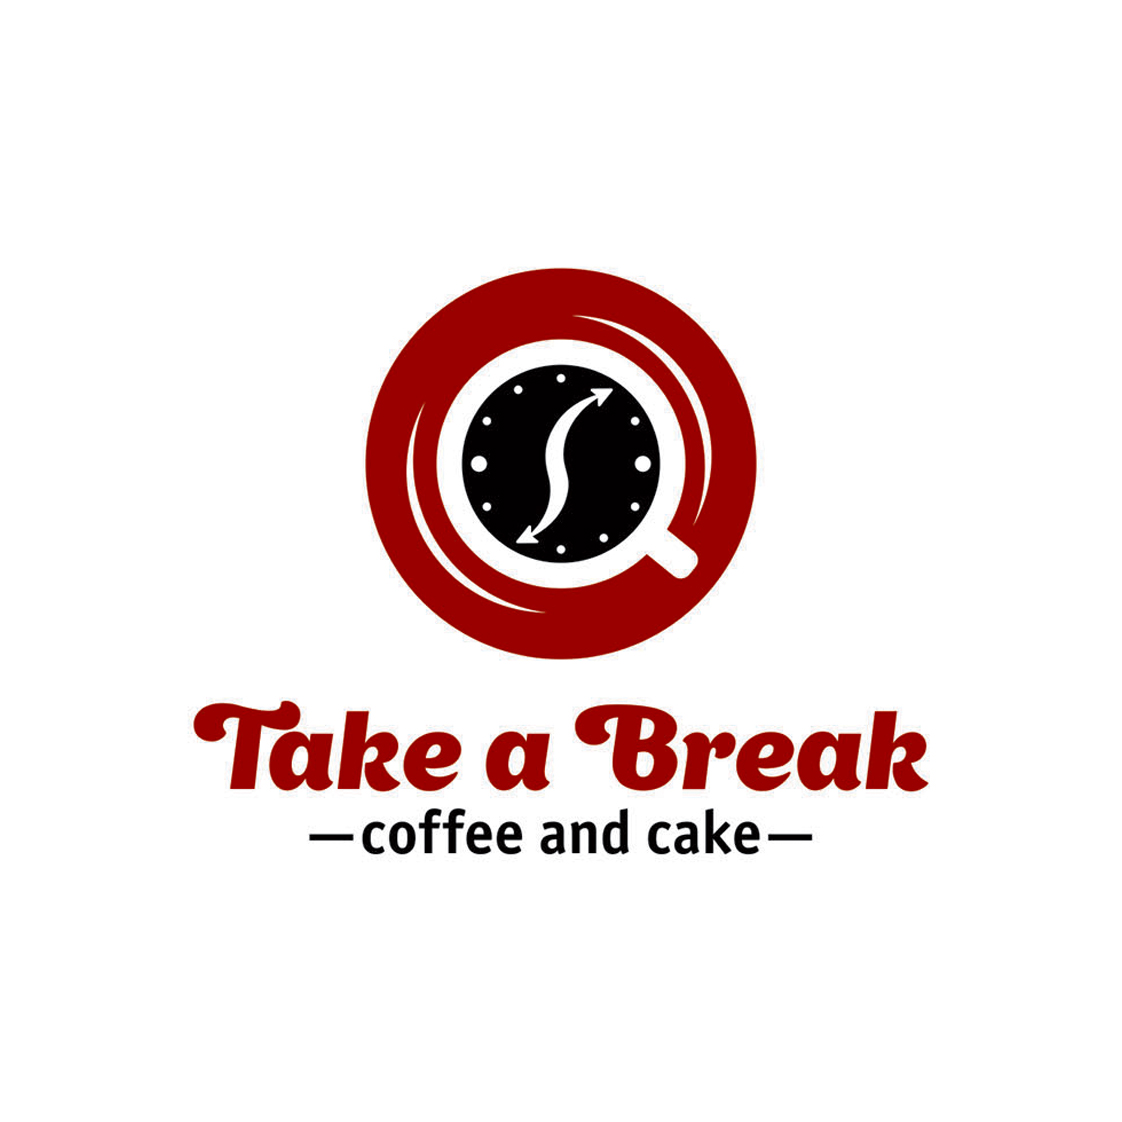 Take a Break, кофе с собой